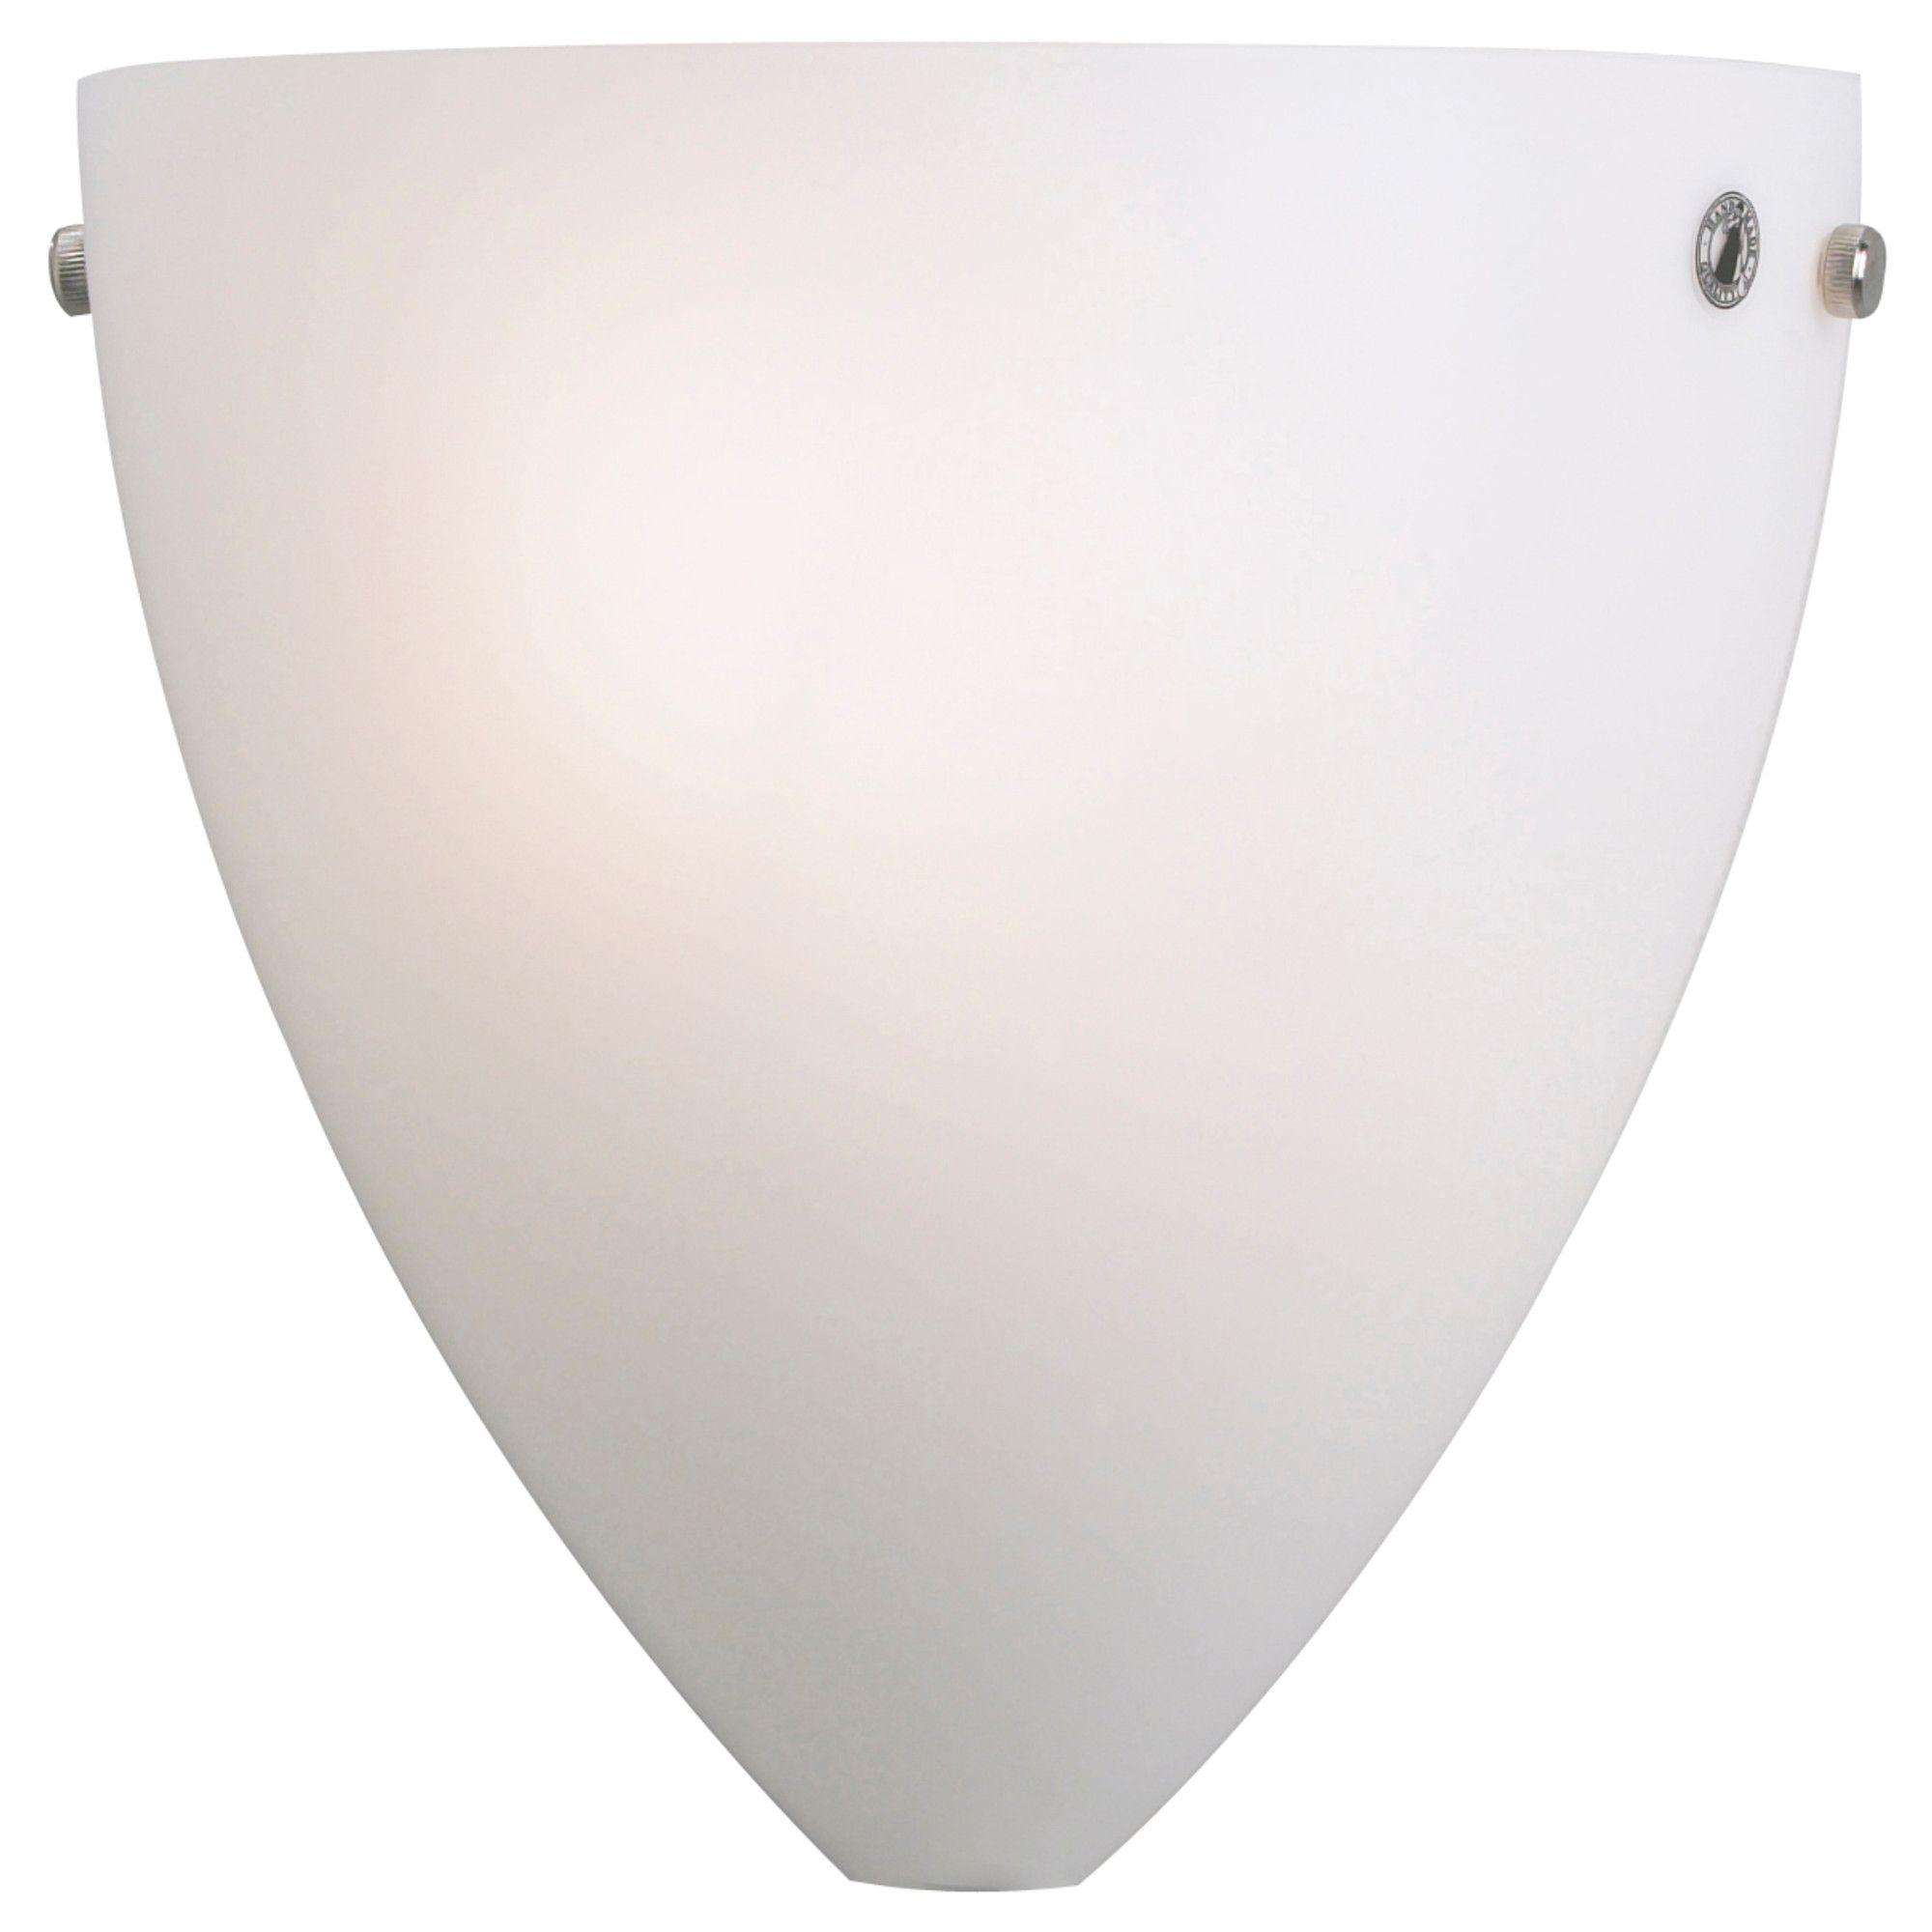 Kvintett lampada da parete a luce indiretta ikea ikea pinterest bulbs walls and lights - Ikea lampade da parete ...